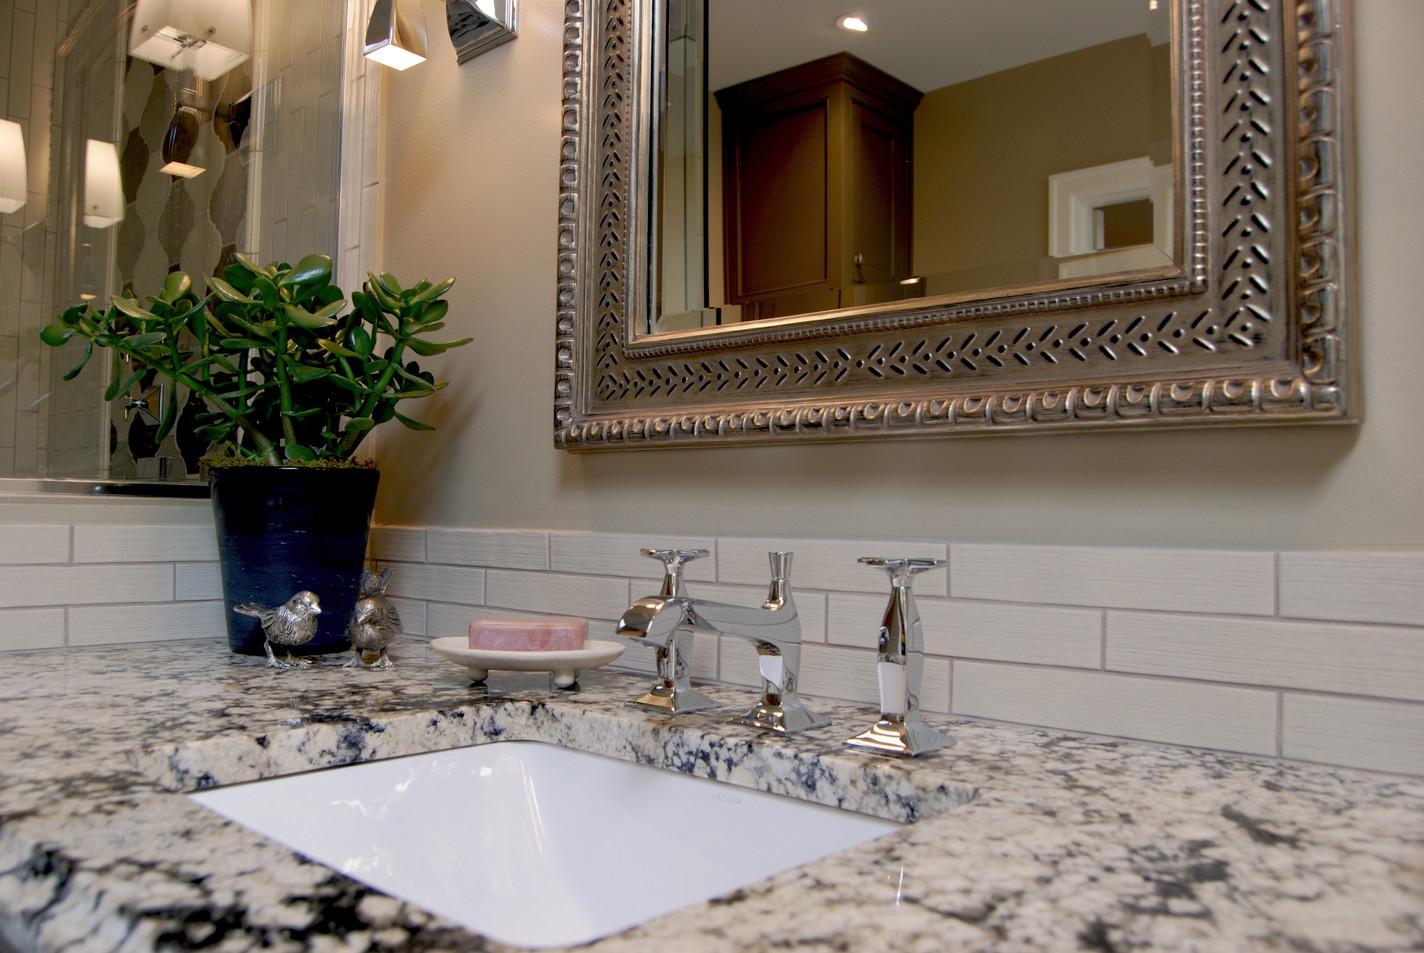 beard sink-faucet-mirror.jpg